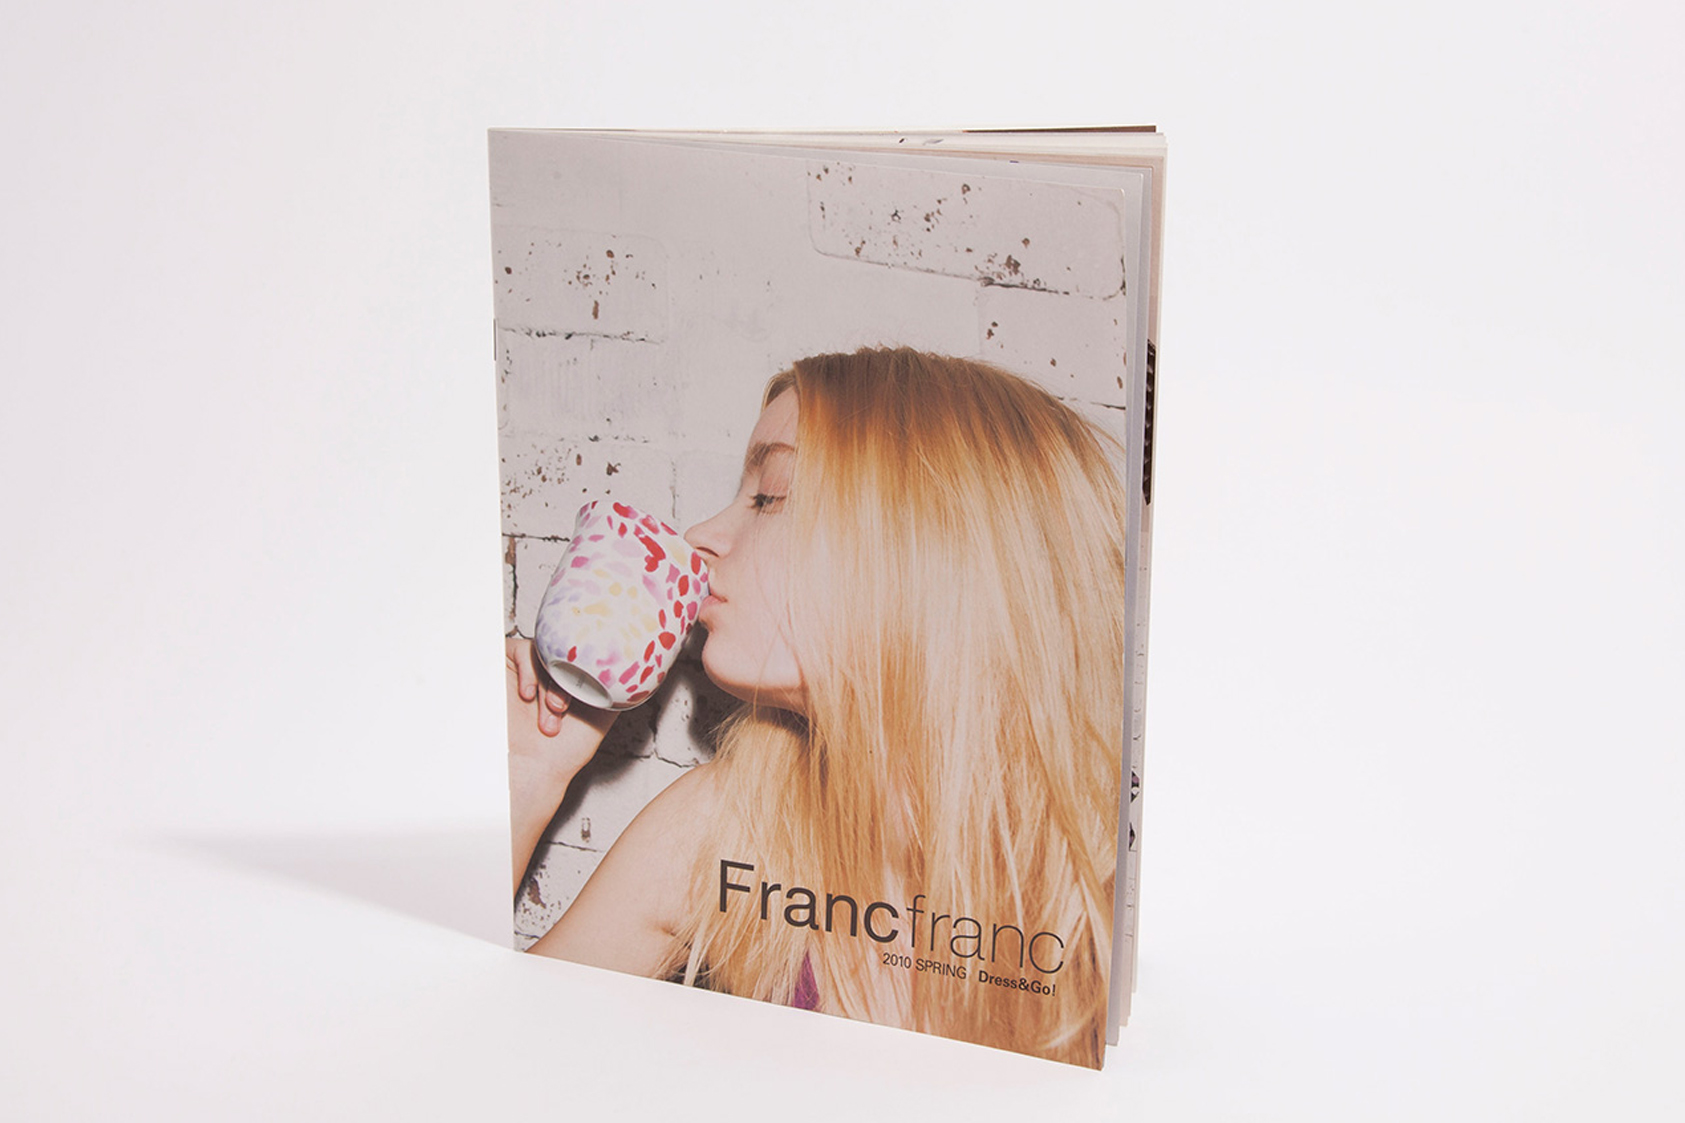 Francfranc2010spring